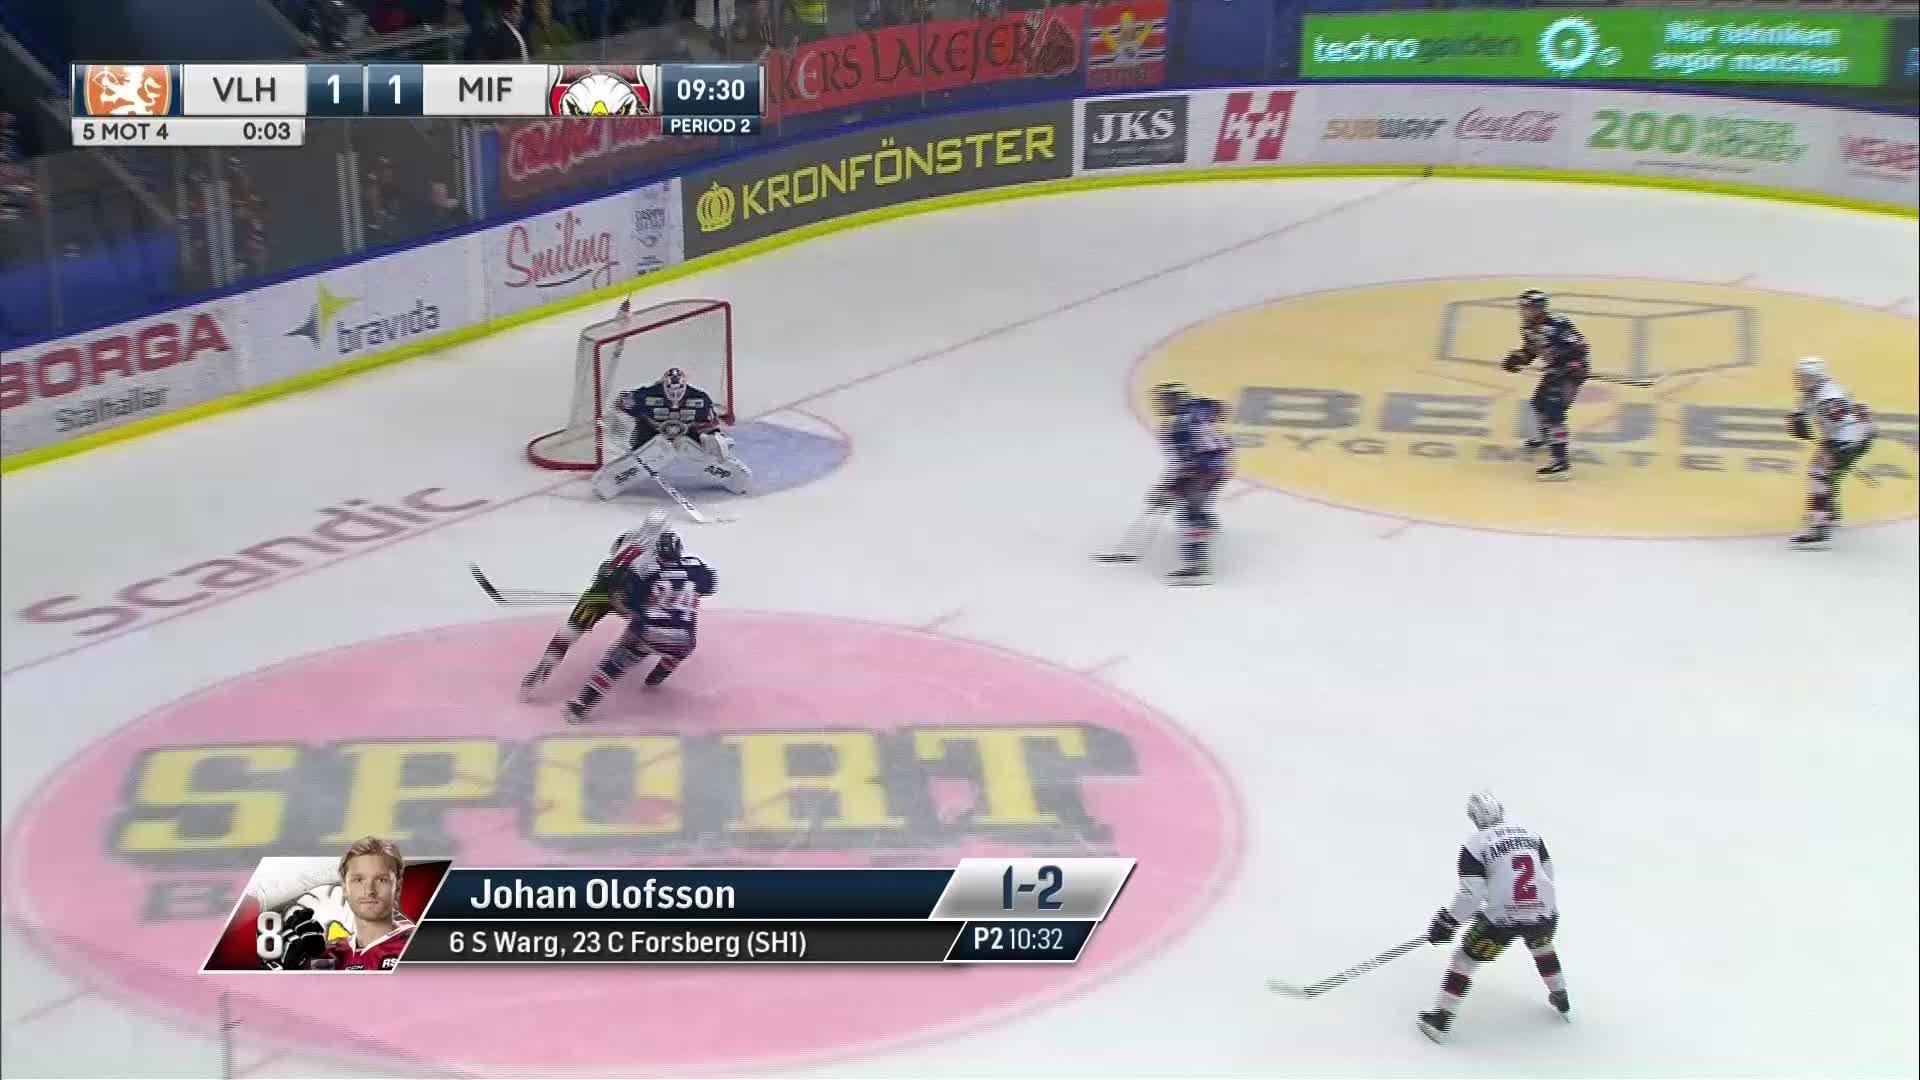 Växjö Lakers - Malmö Redhawks 1-2